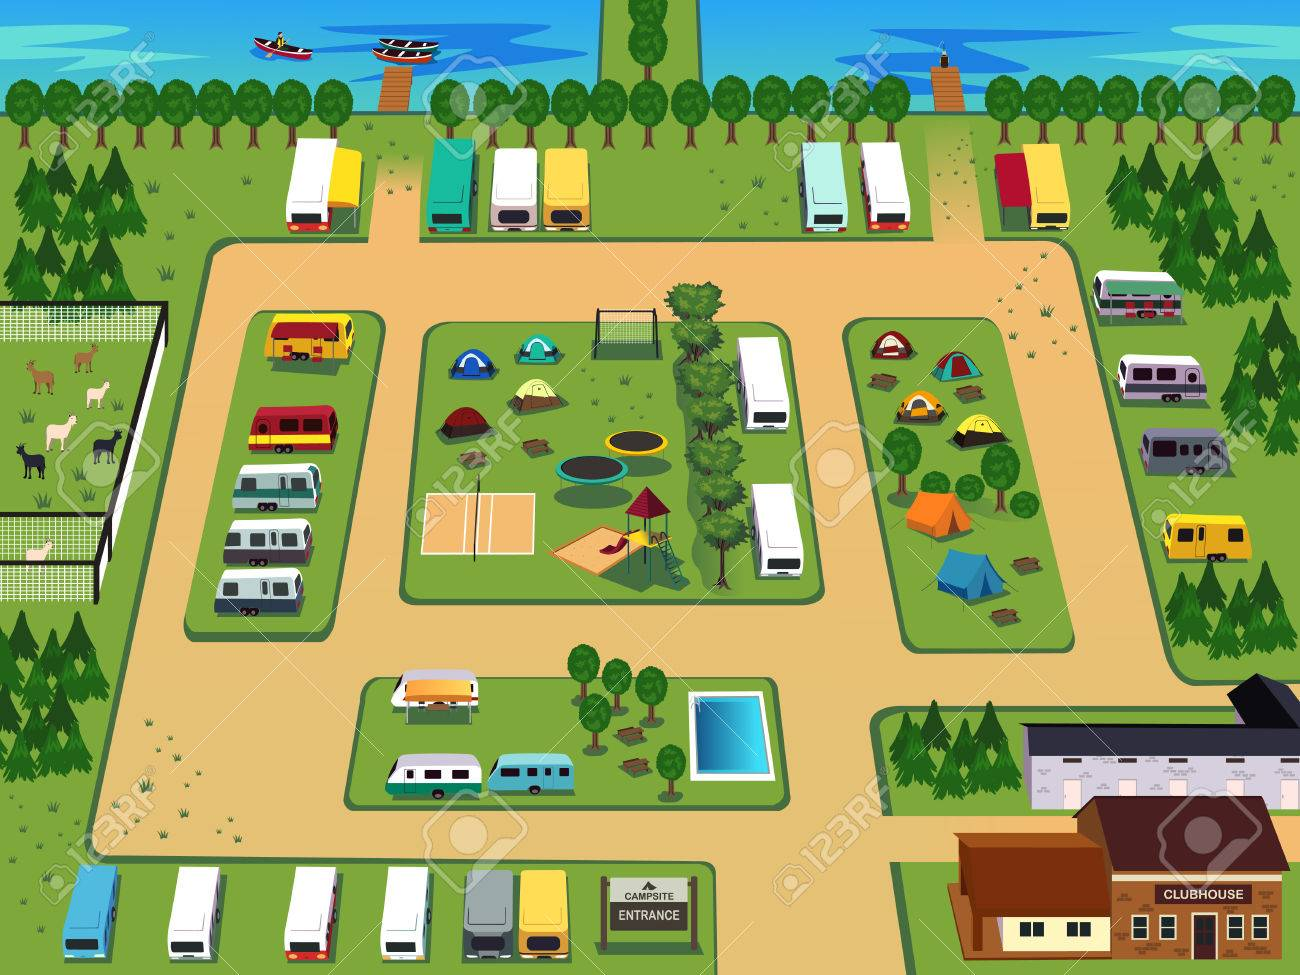 Una Ilustracion Del Mapa Del Camping Diseno Ilustraciones